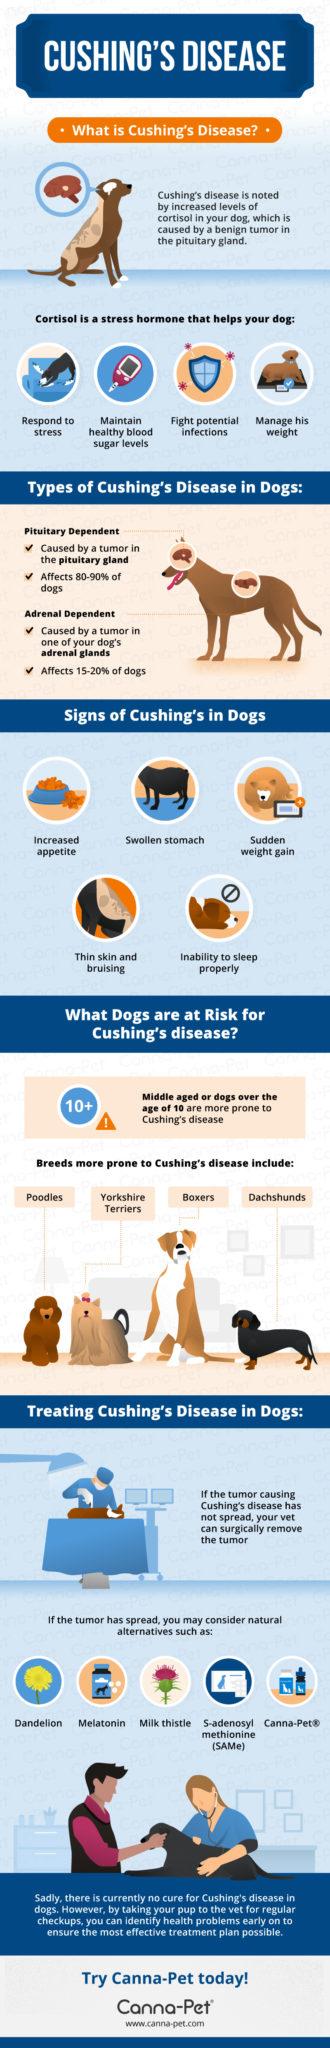 Cushings Disease in Dogs Canna Pet